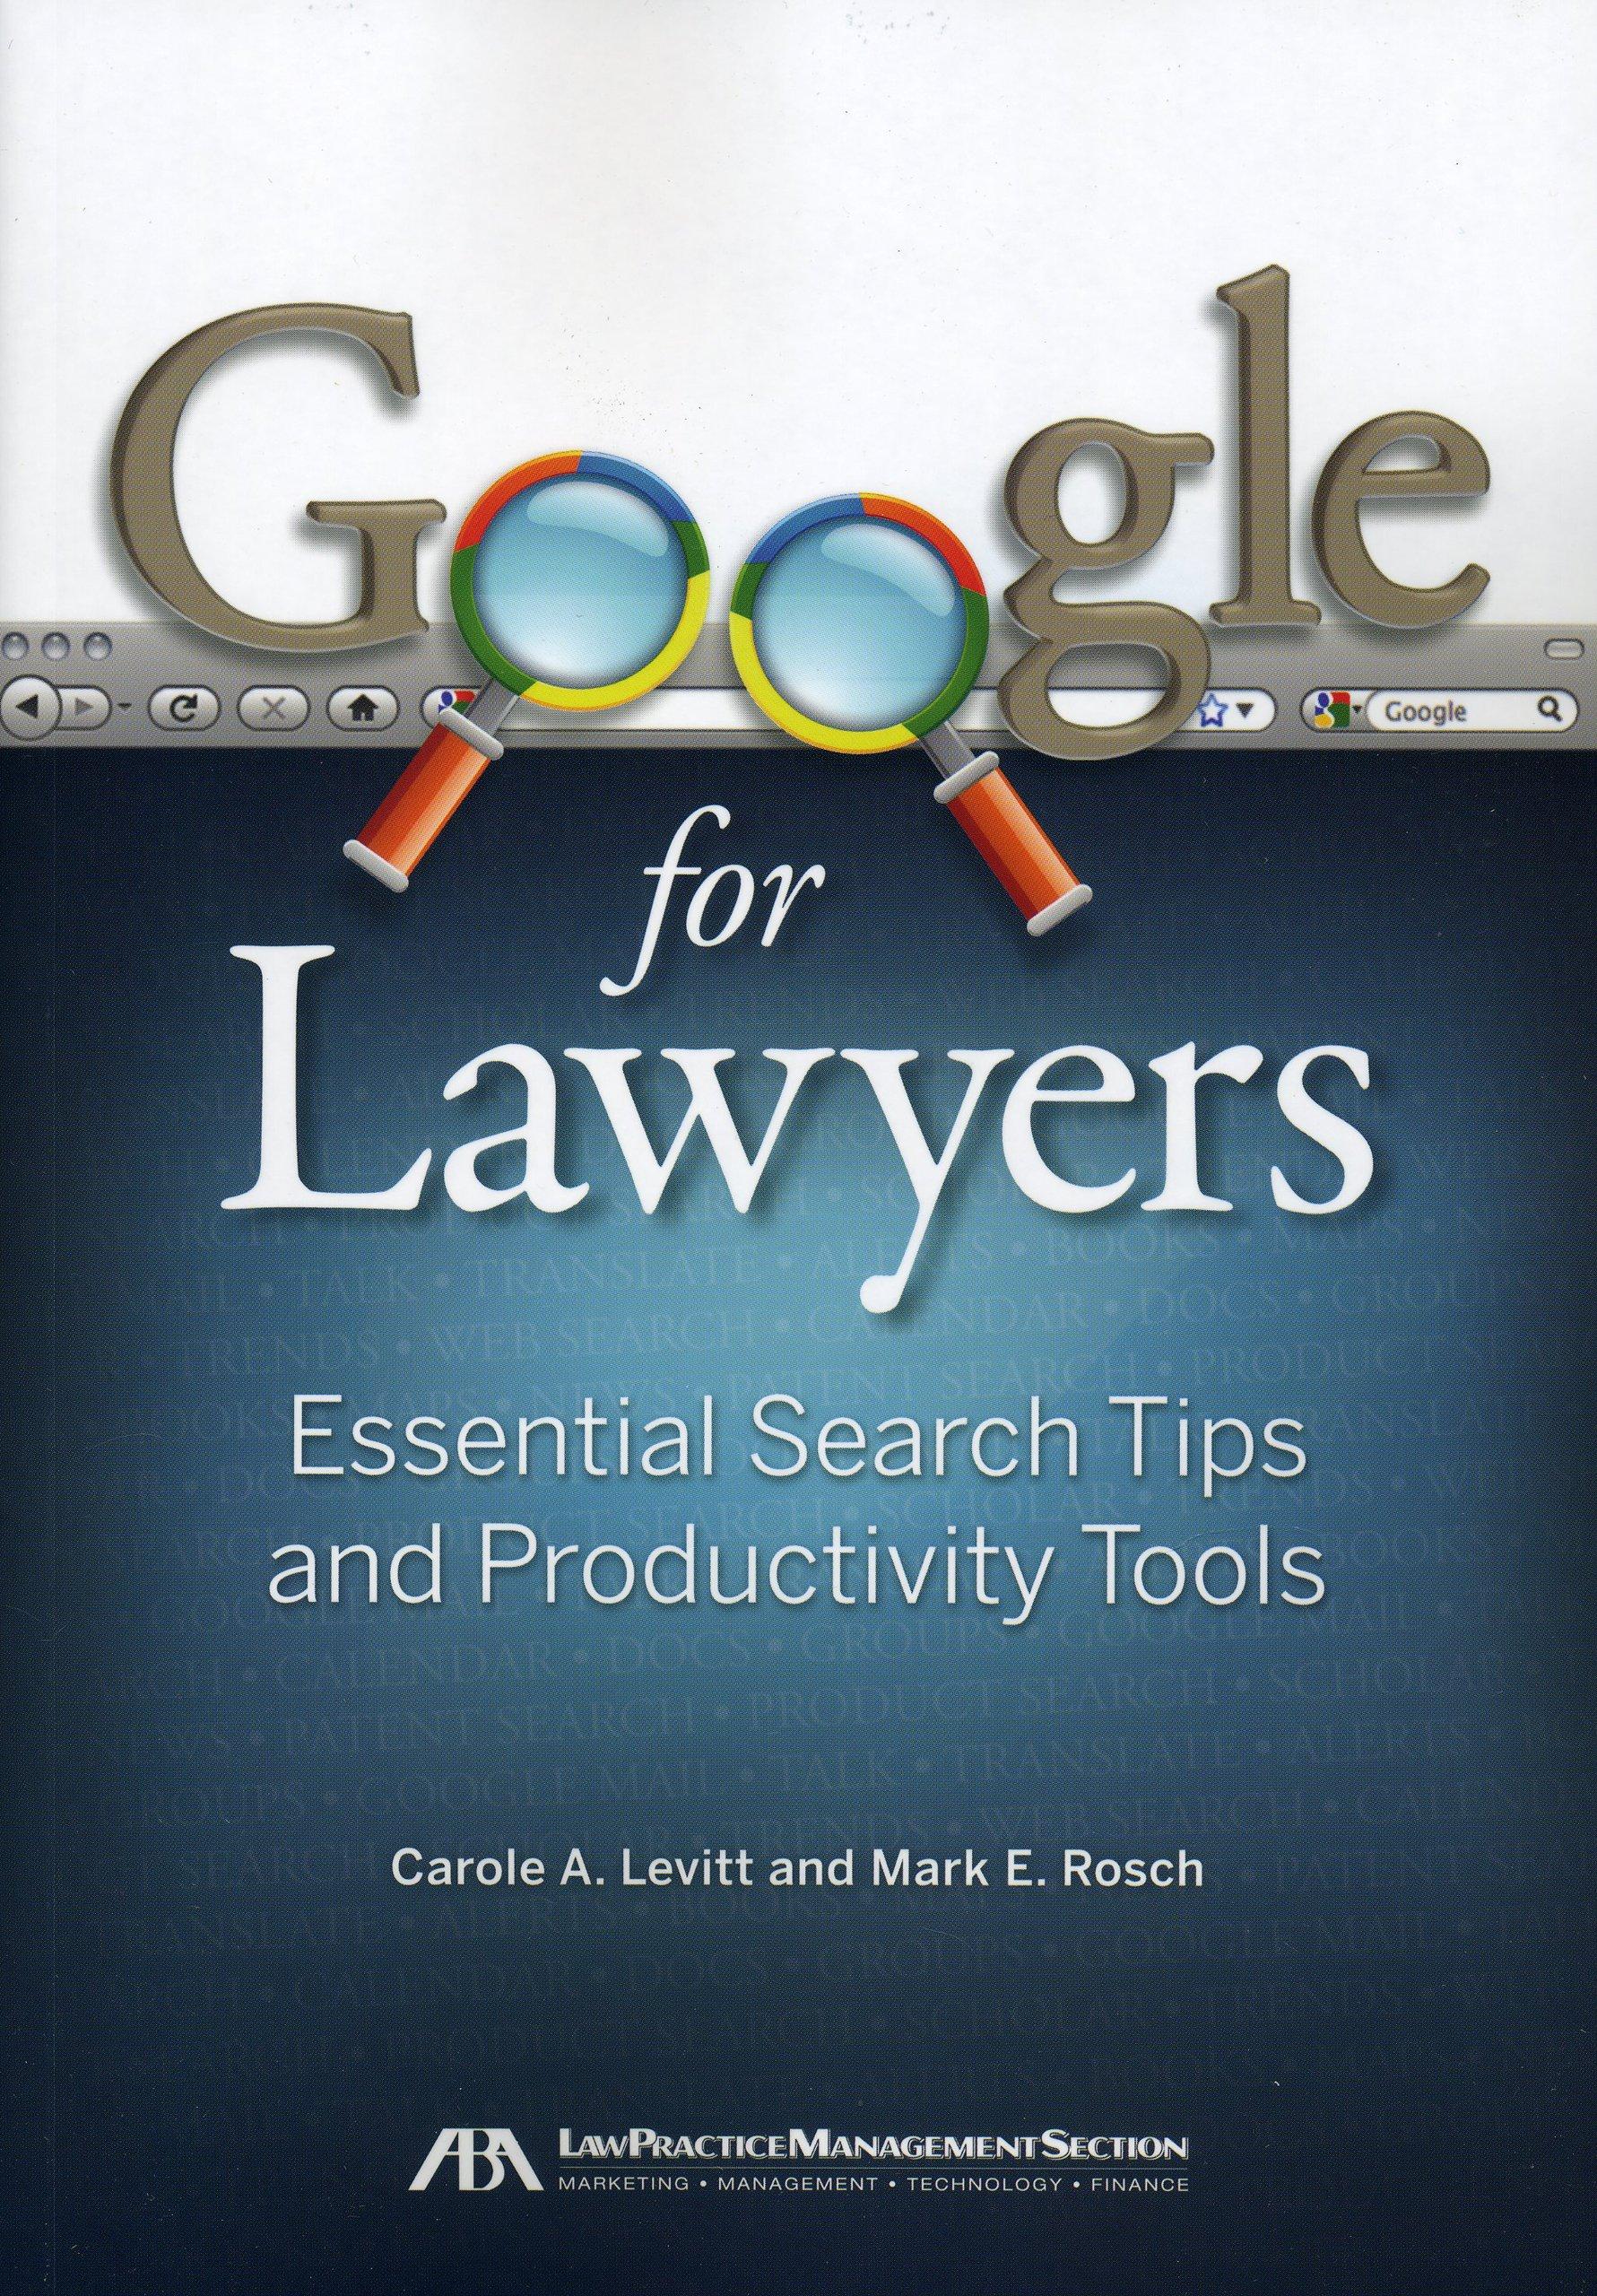 amazon search tools